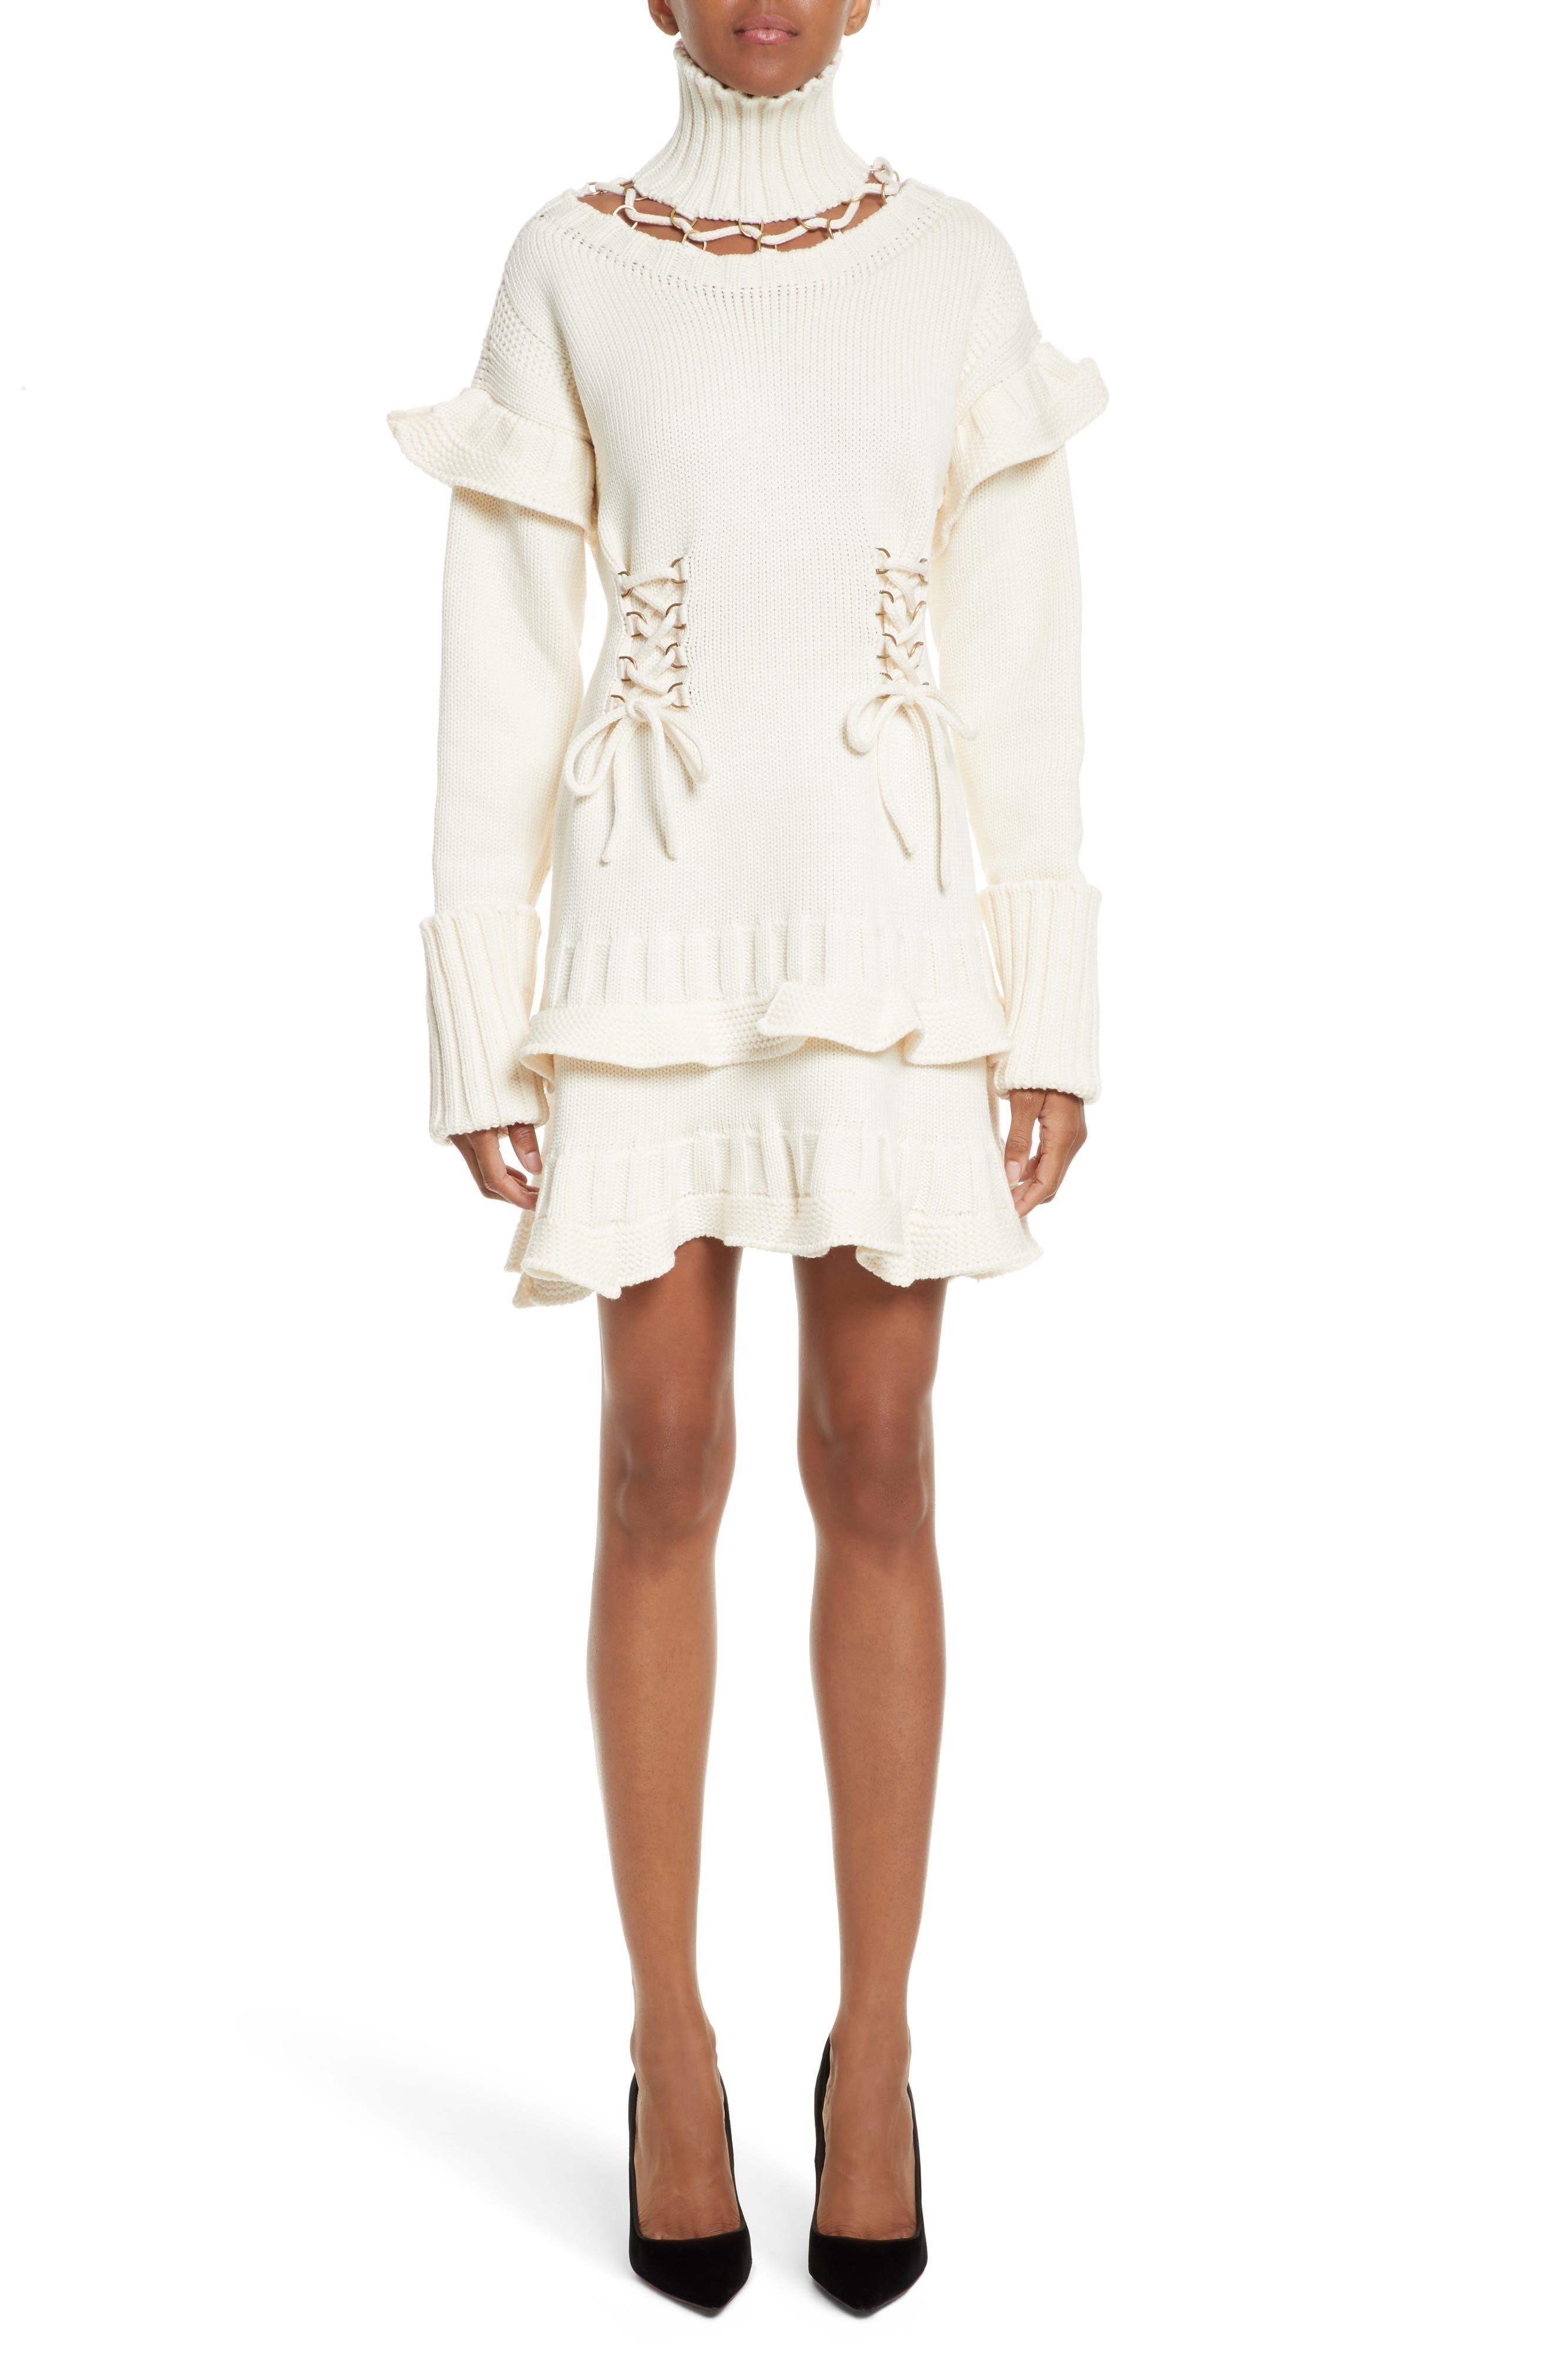 Main Image - Alexander McQueen Lace-Up Turtleneck Sweater Dress